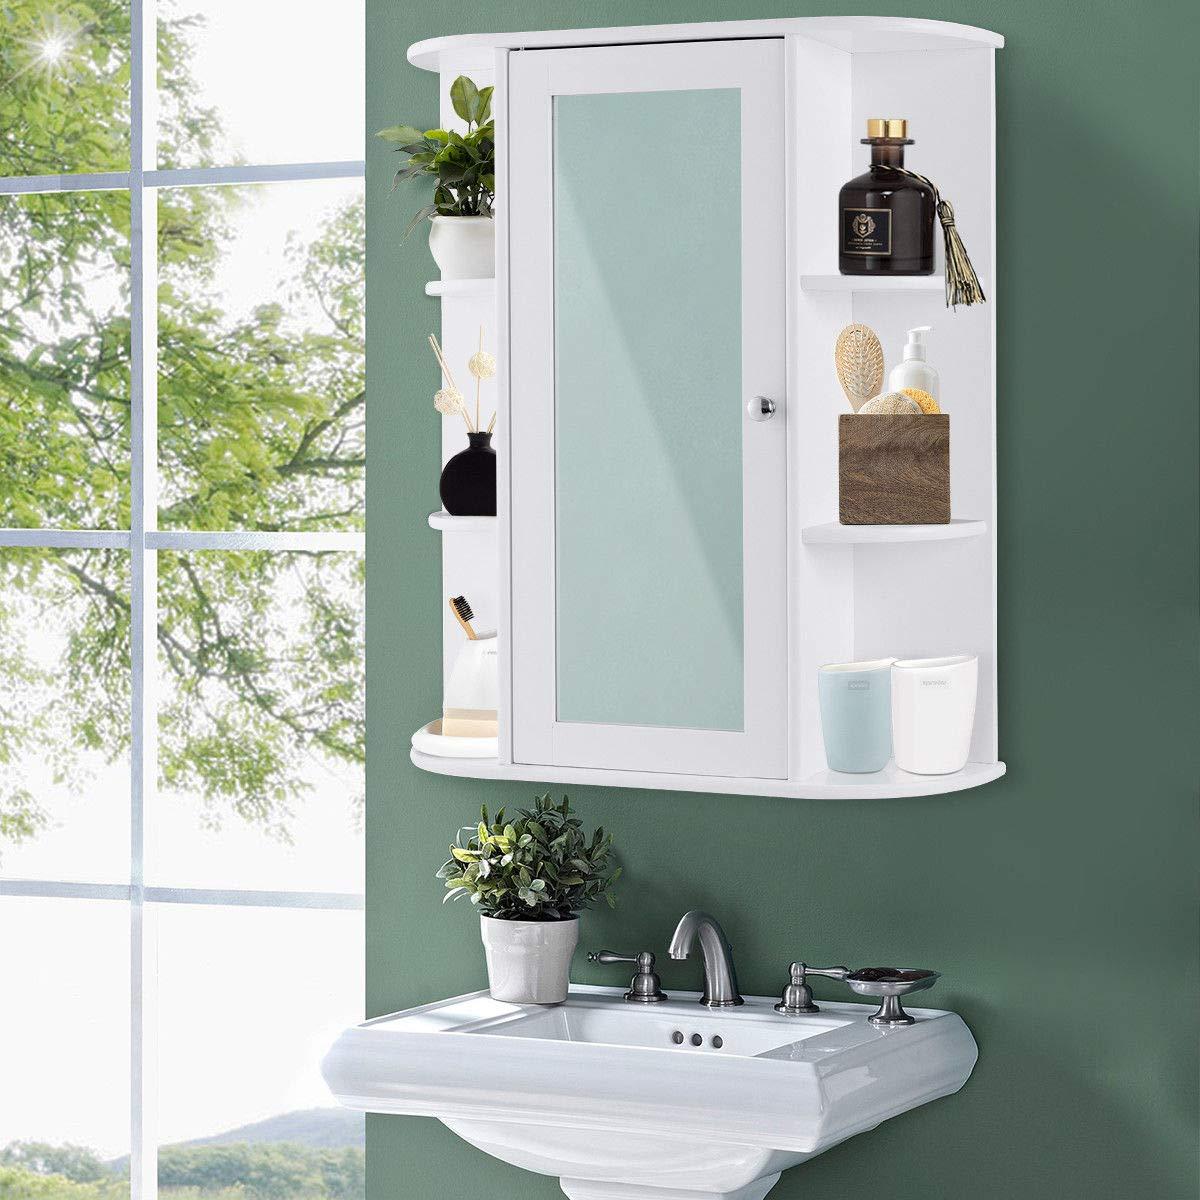 TANGKULA Bathroom Cabinet Single Door Wall Mount Mirror Organizer Storage Cabinet(2 Tier Inner Shelves) by TANGKULA